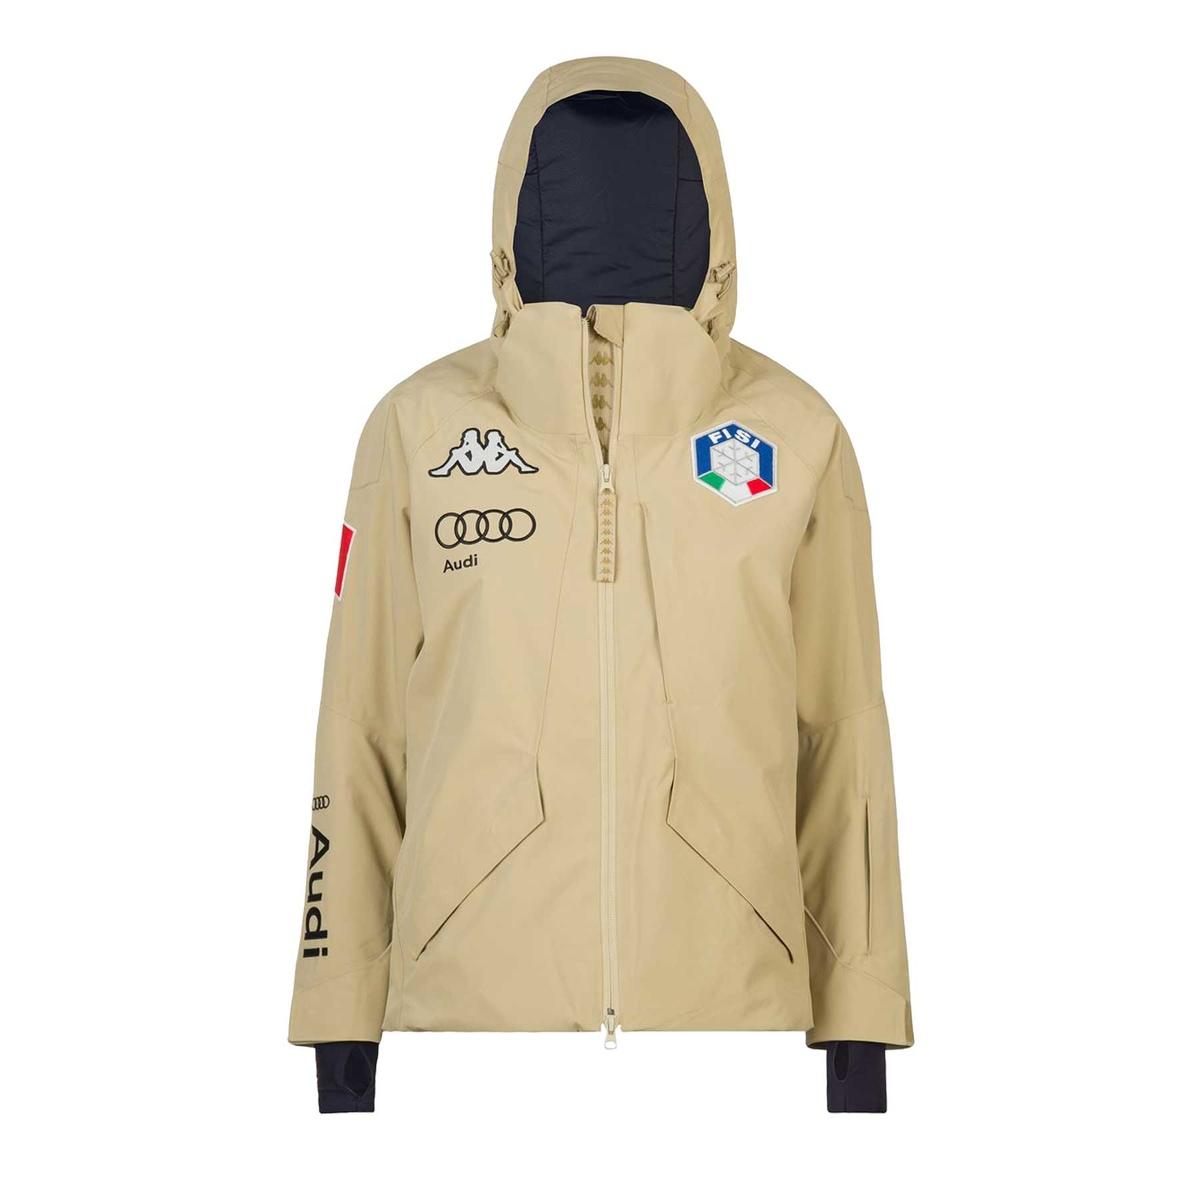 Prezzi Kappa giacca 6cento 612 fisi donna